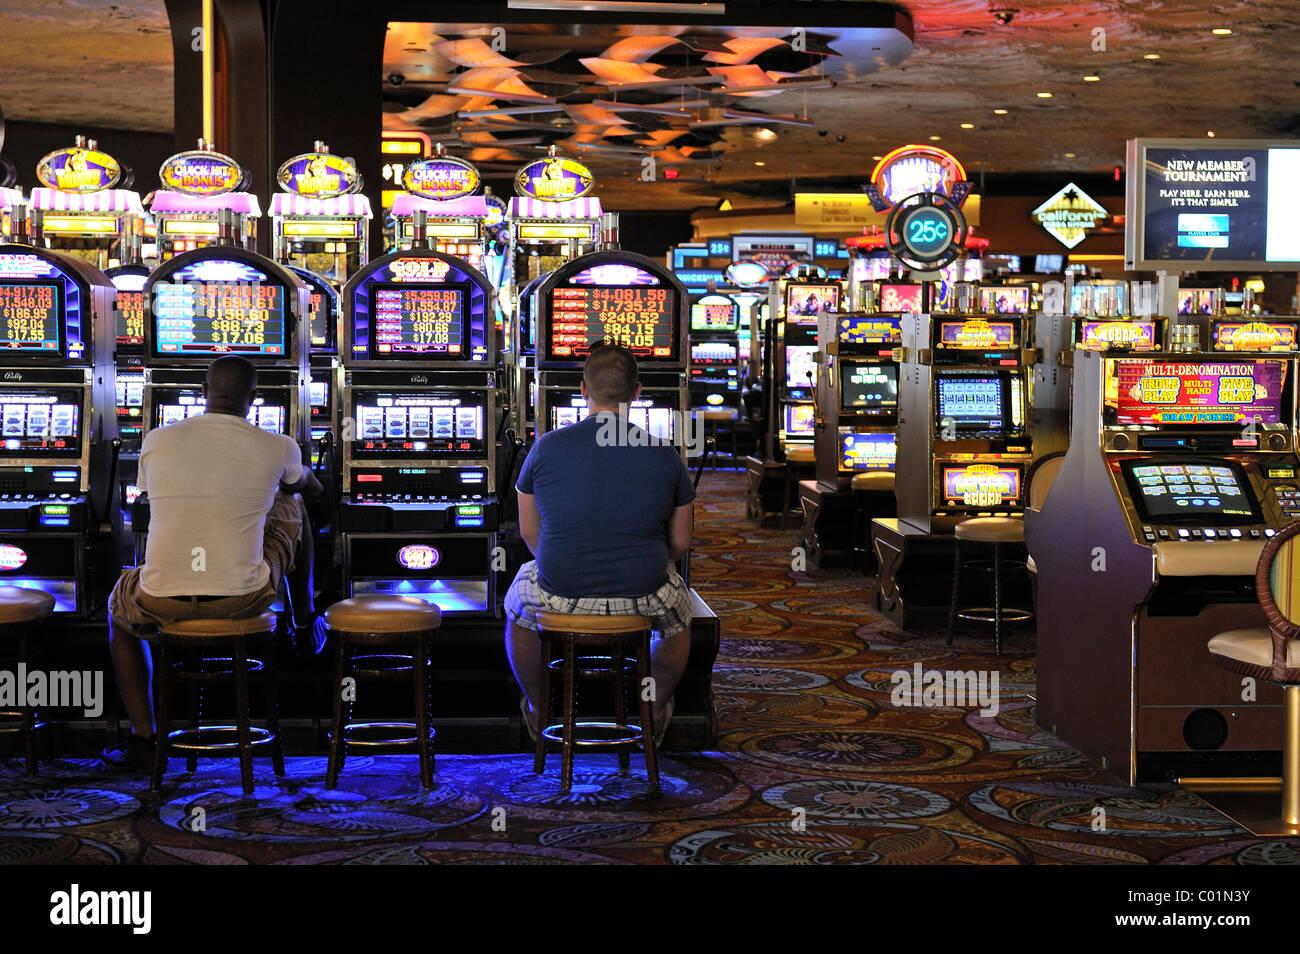 Slot casino paypal